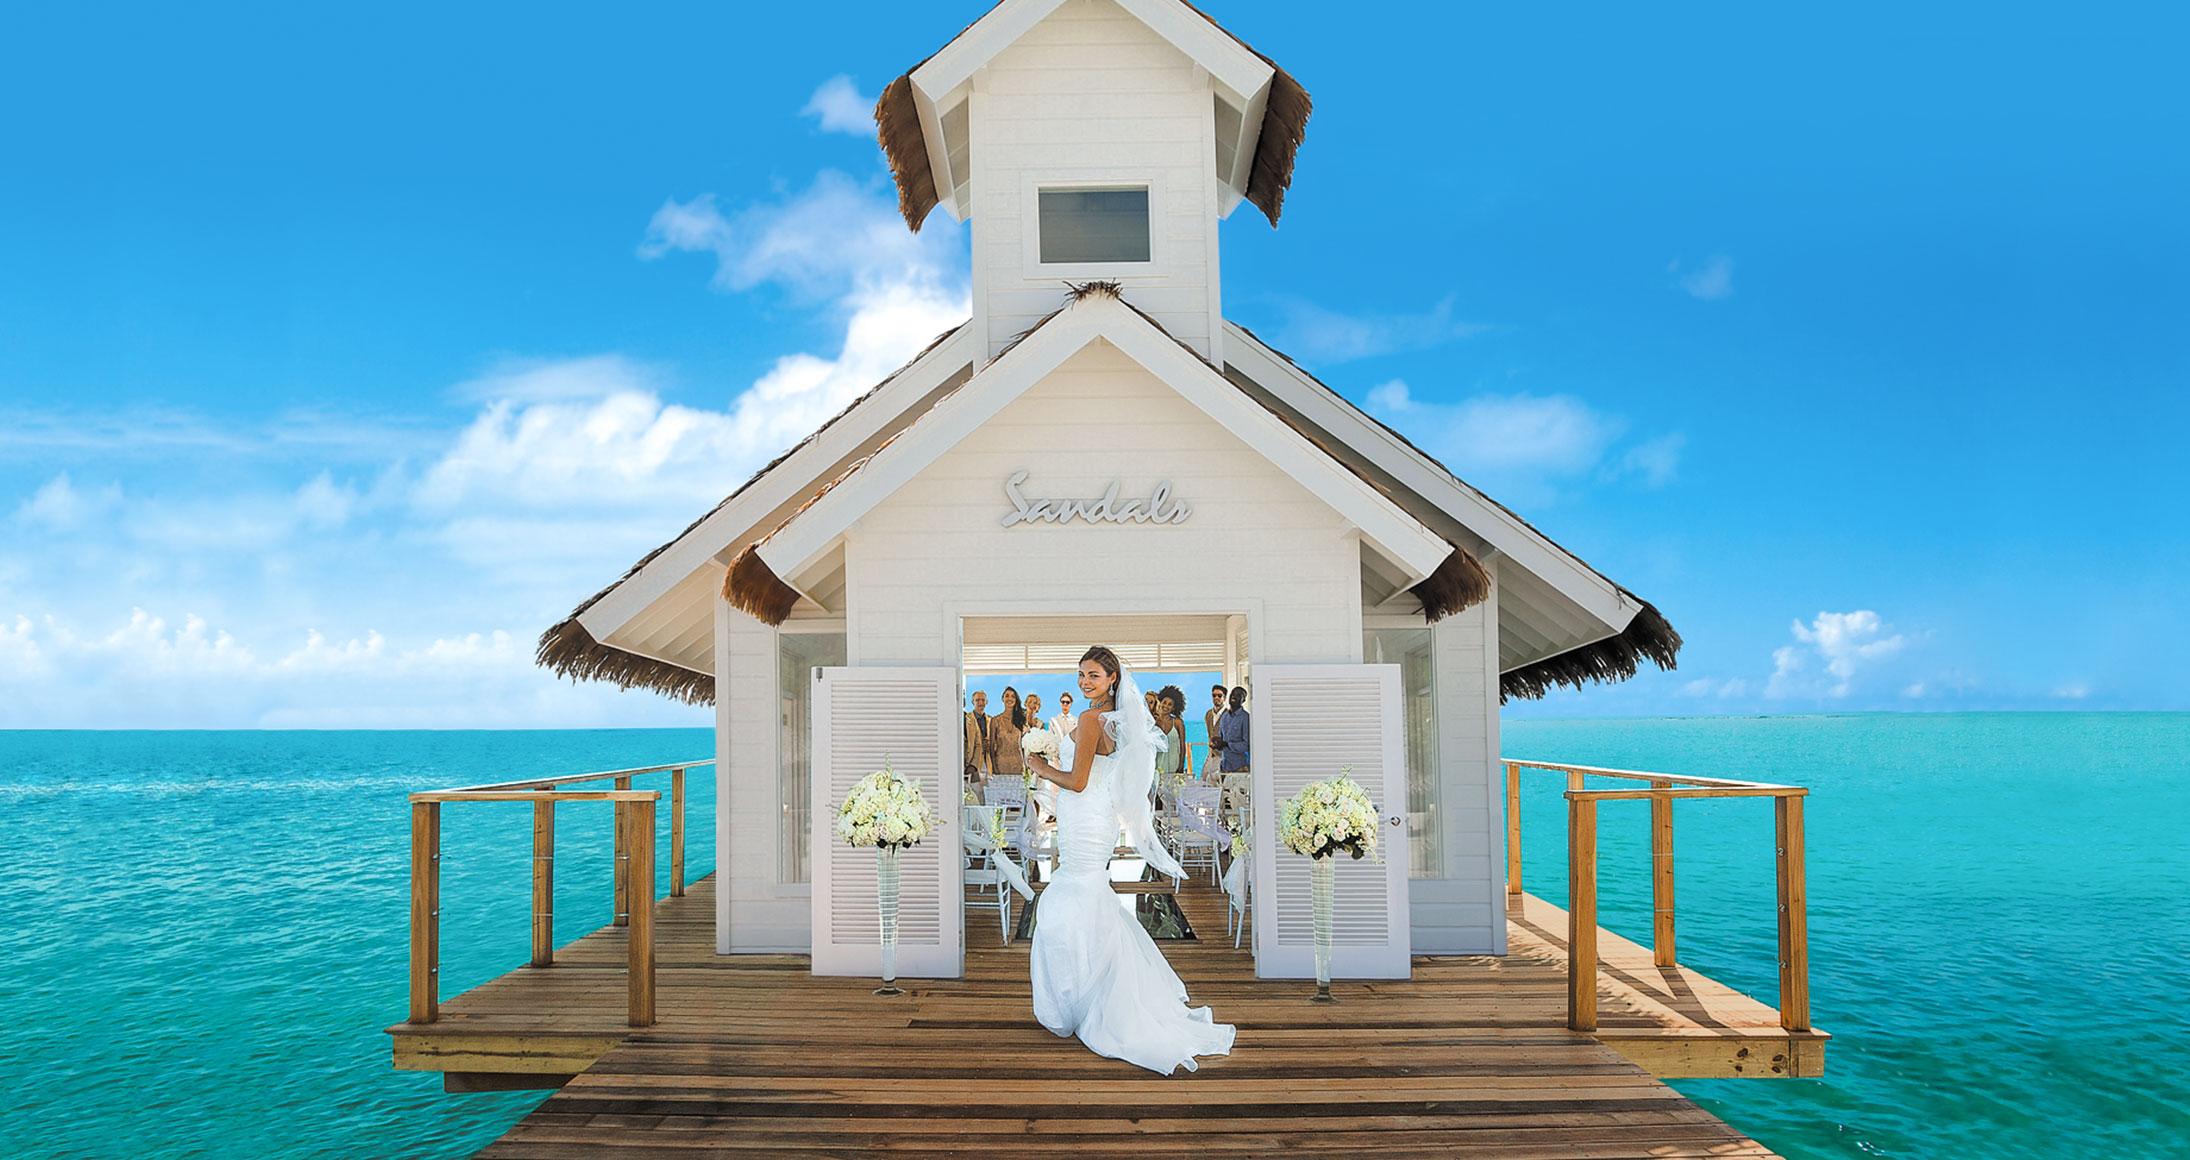 Best Wedding Venues Destinations In The Caribbean Sandals